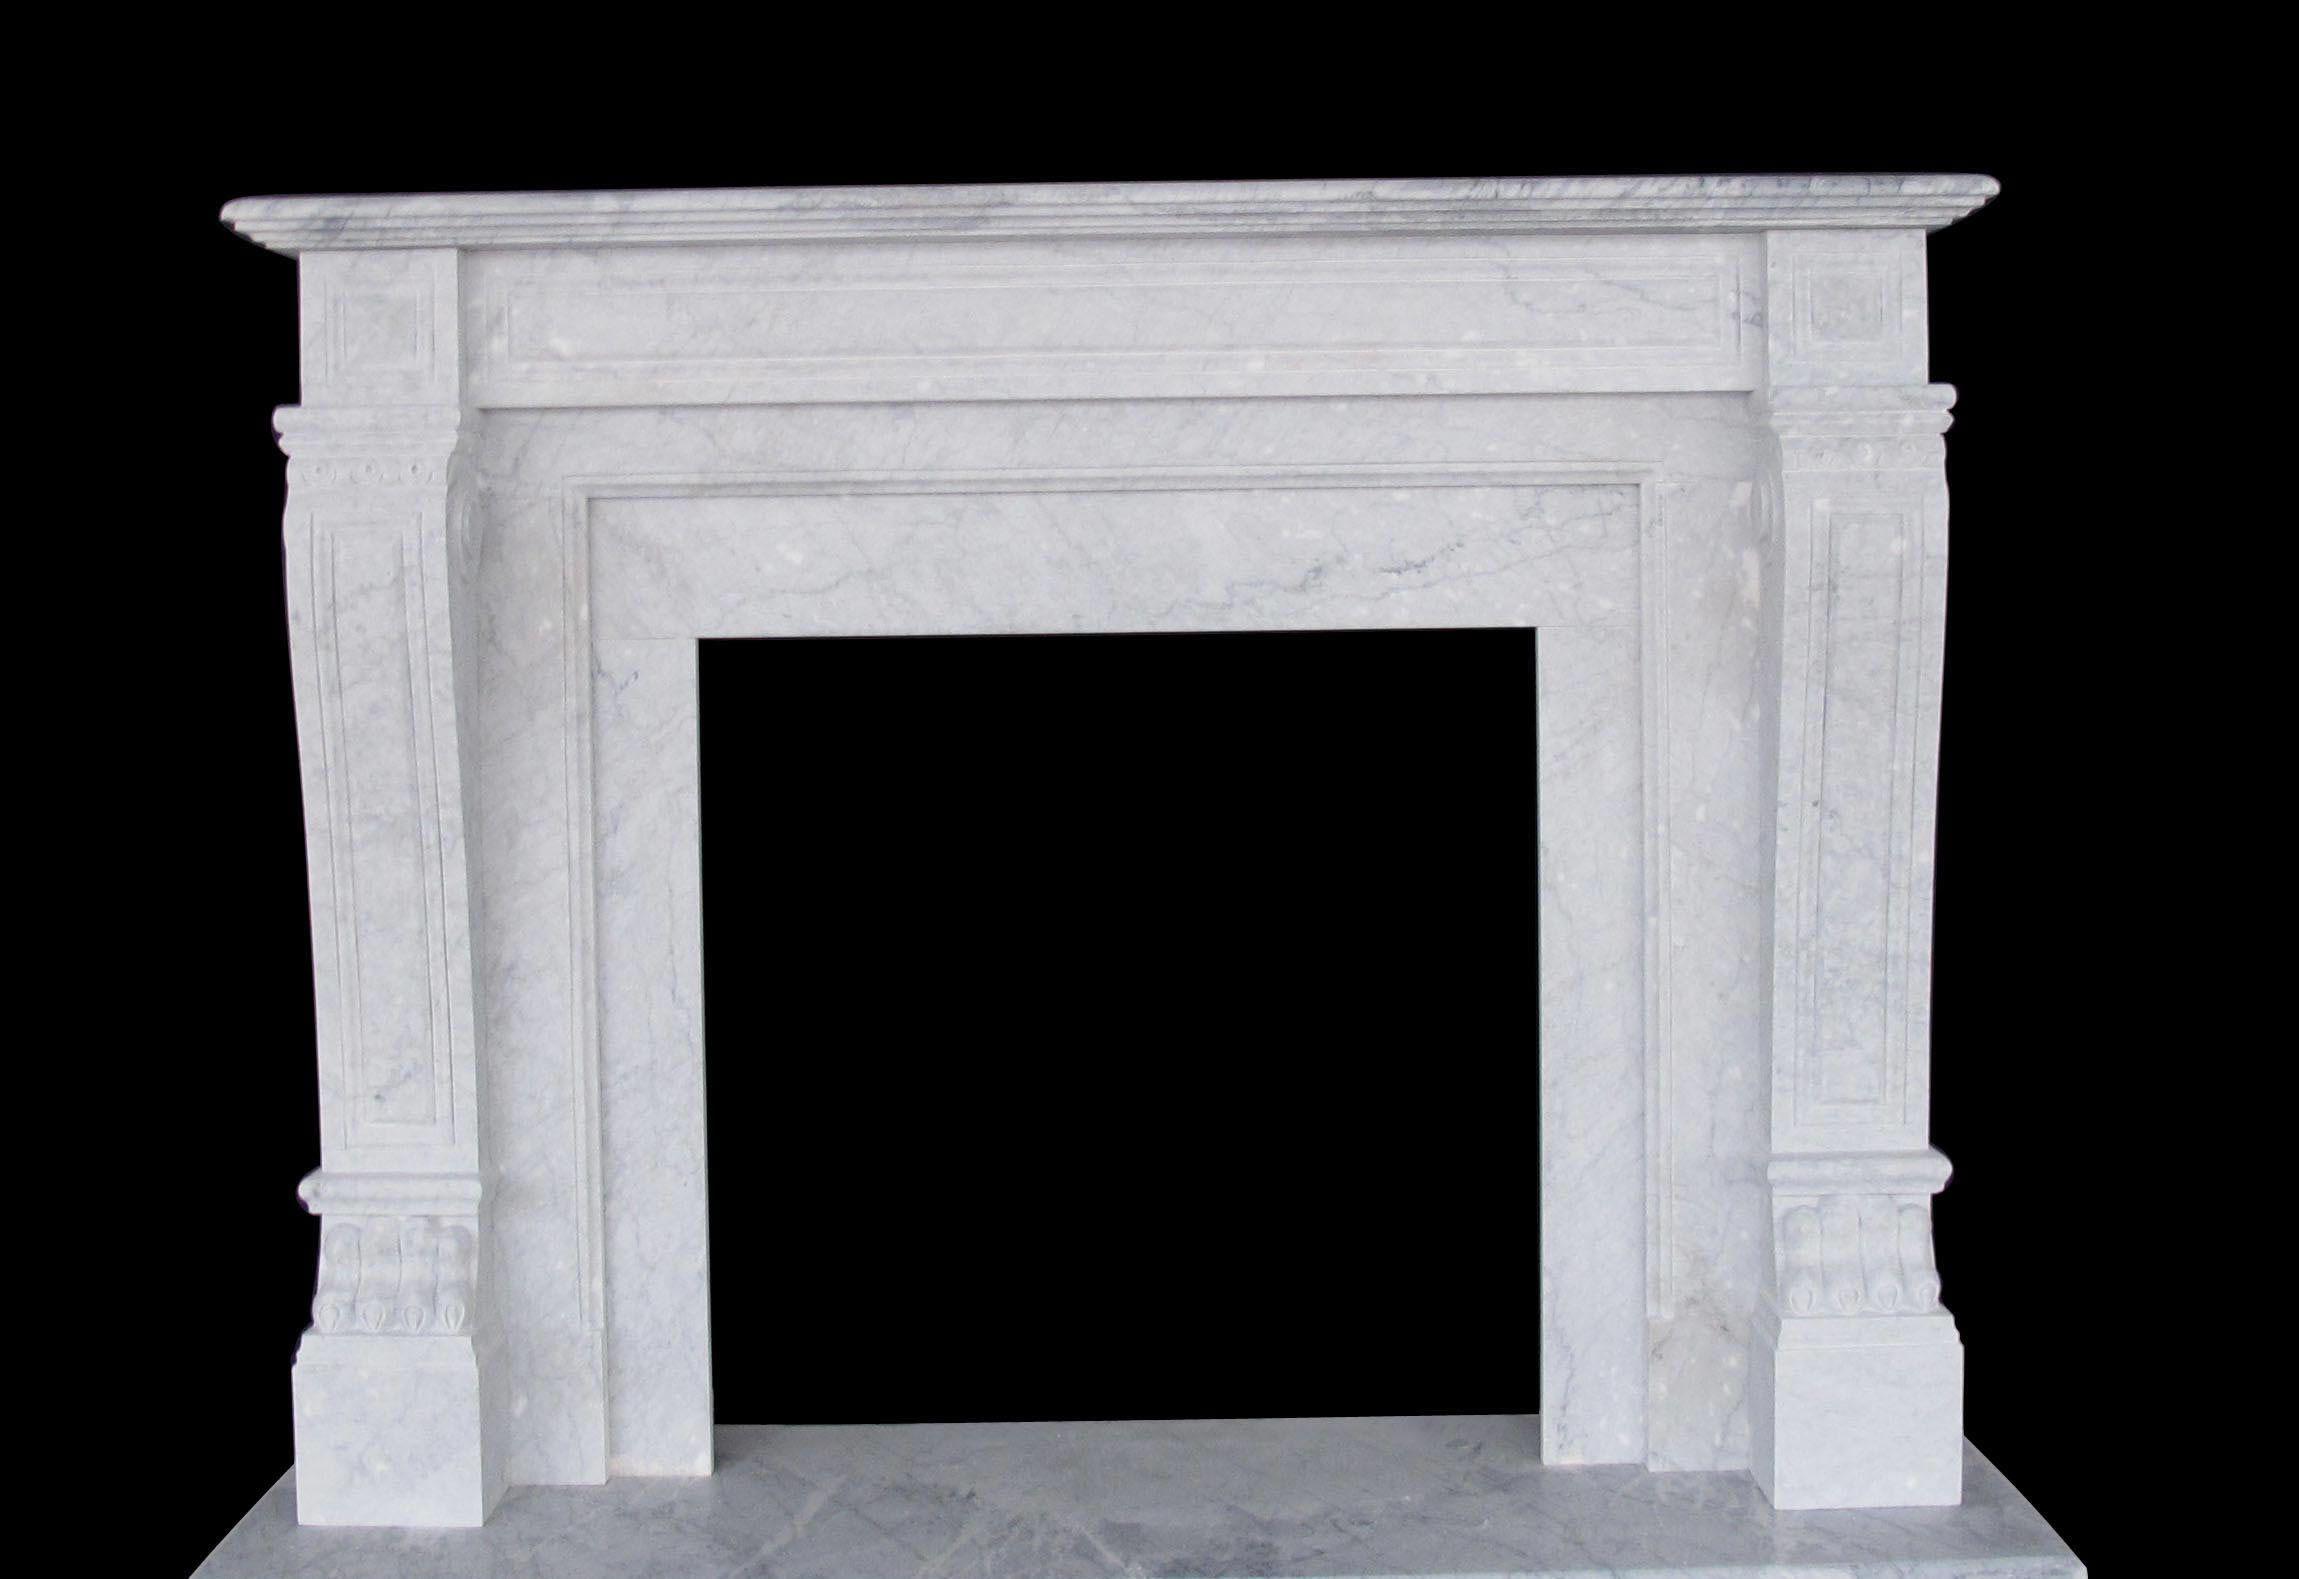 Italian Regal Marble Fireplaces Sale - Carrera White Mantels,  #Carrera #farmhousefireplacemantelsfrenchcountry #Fireplaces #Italian #Mantels #Marble #Regal #Sale #White